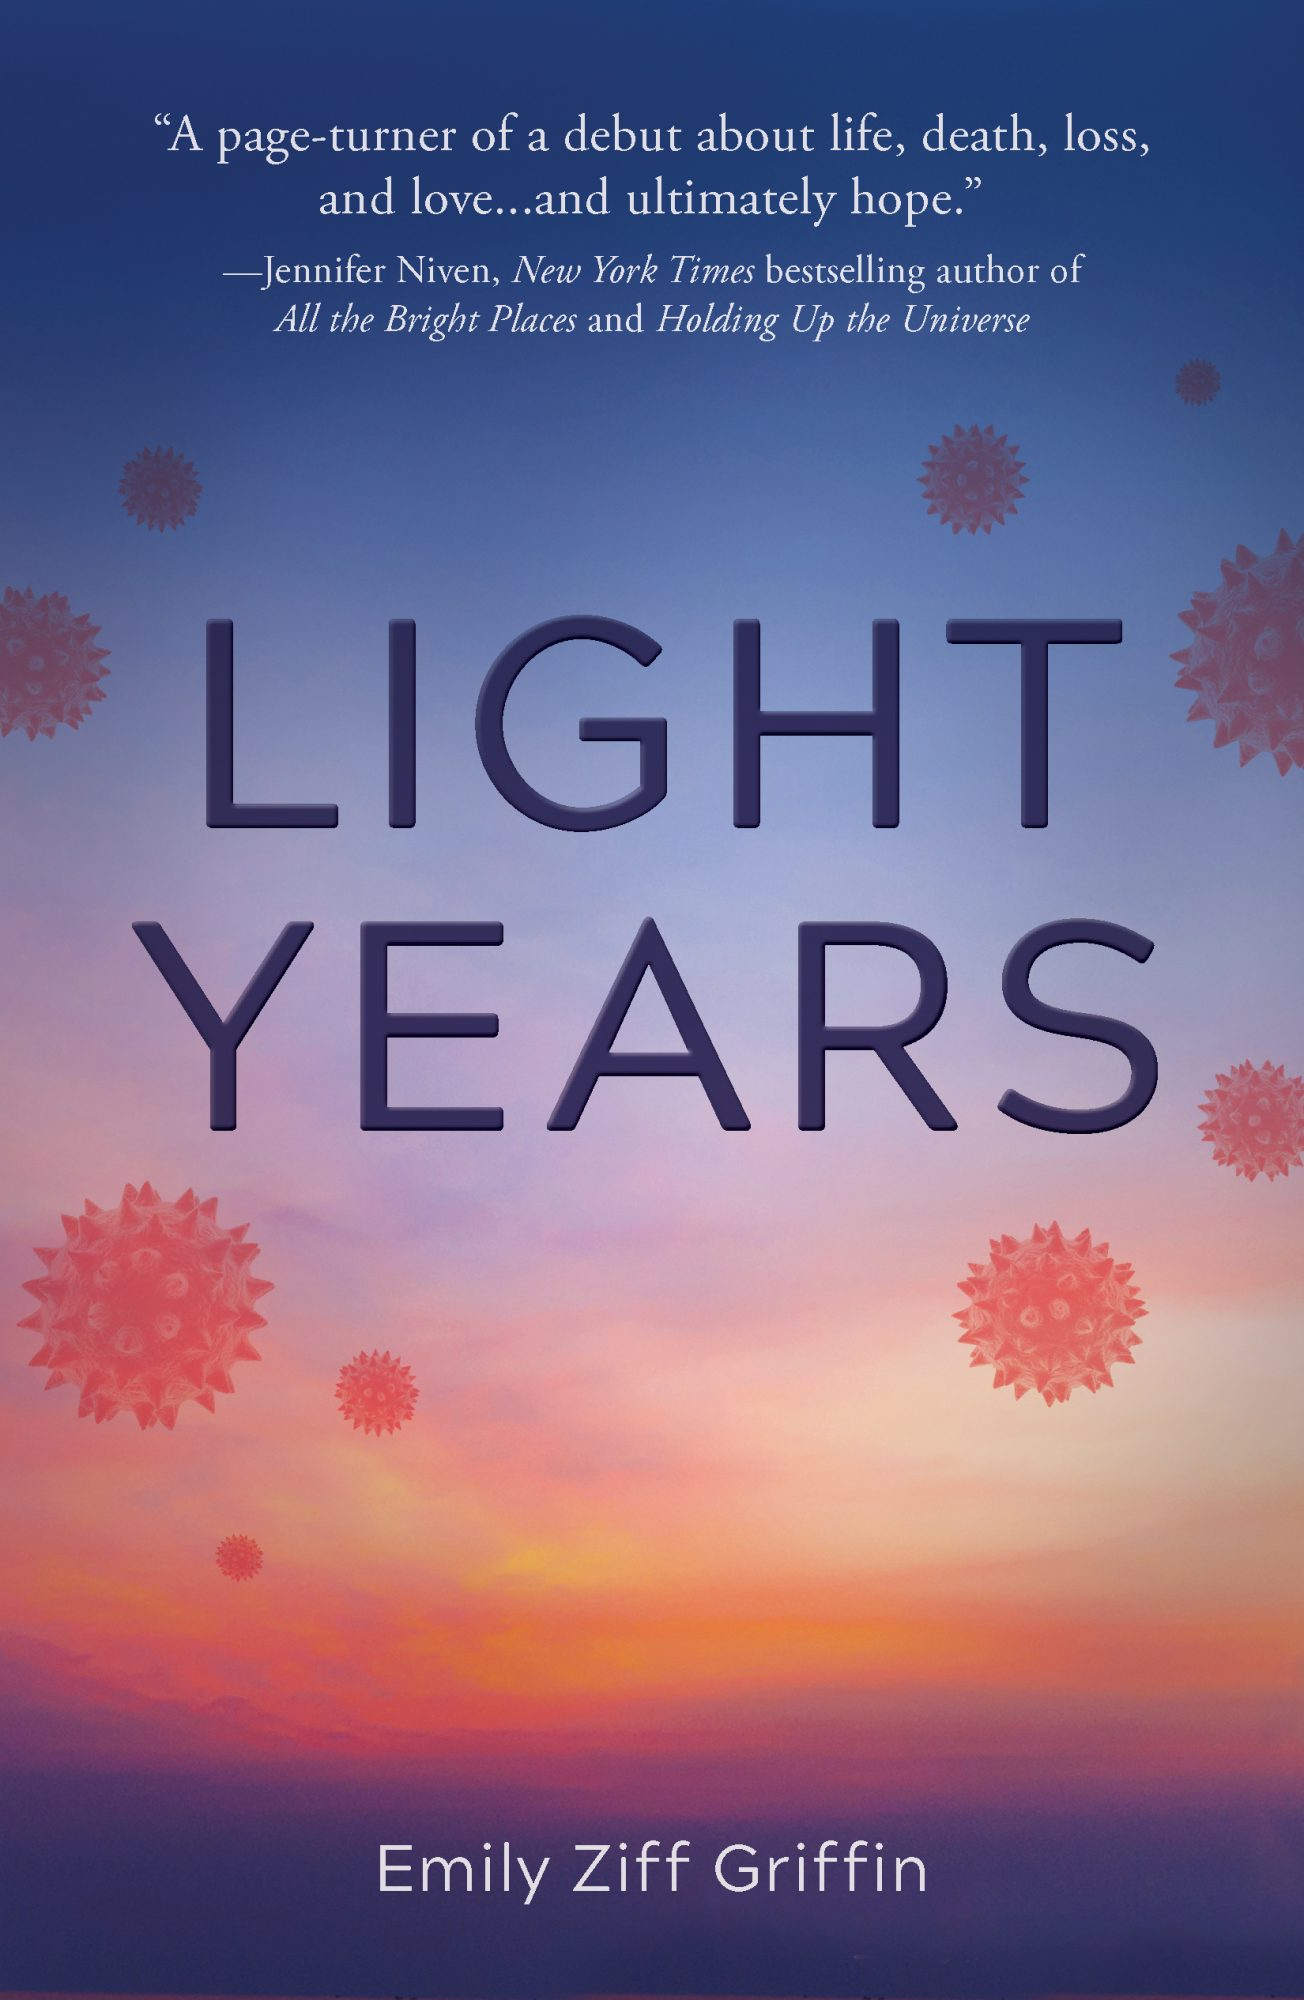 Light Years jacket